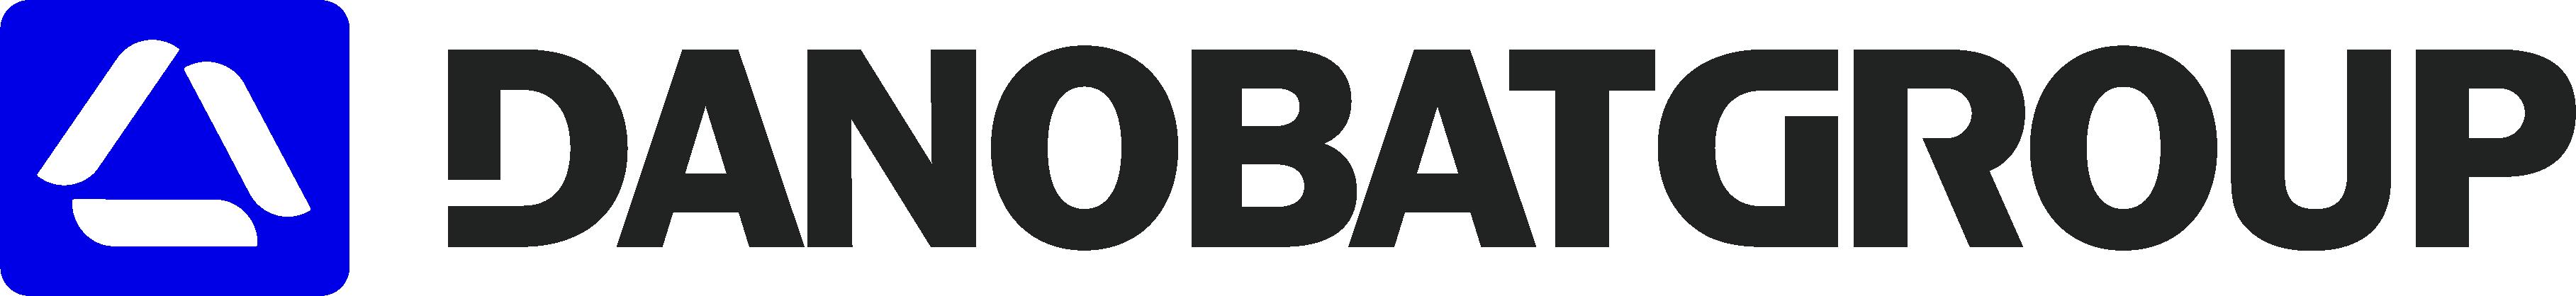 Цветной логотип DANOBATGROUP